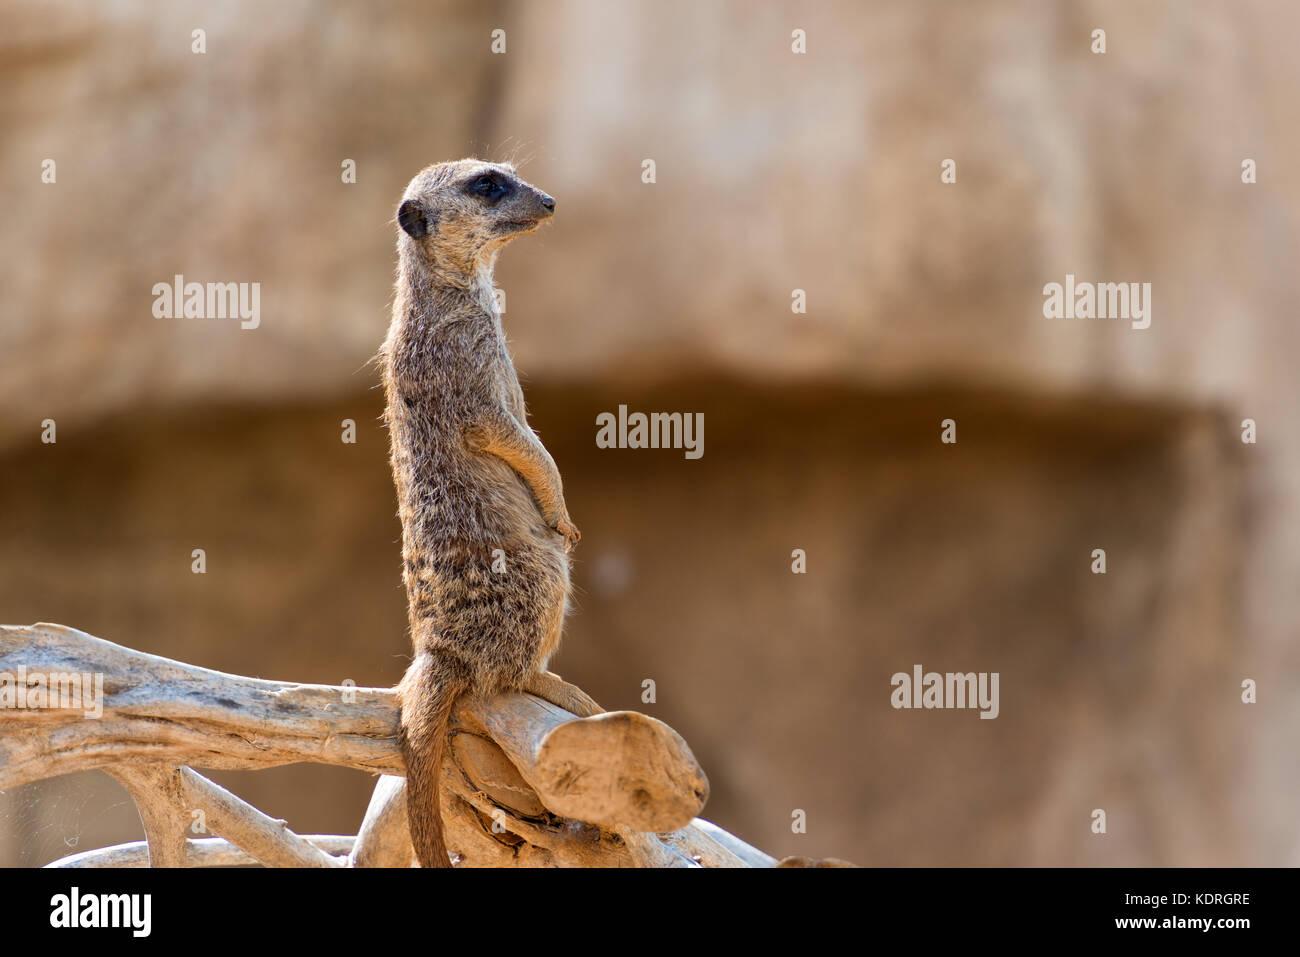 south african suricata suricatta meerkat standing and observing - Stock Image